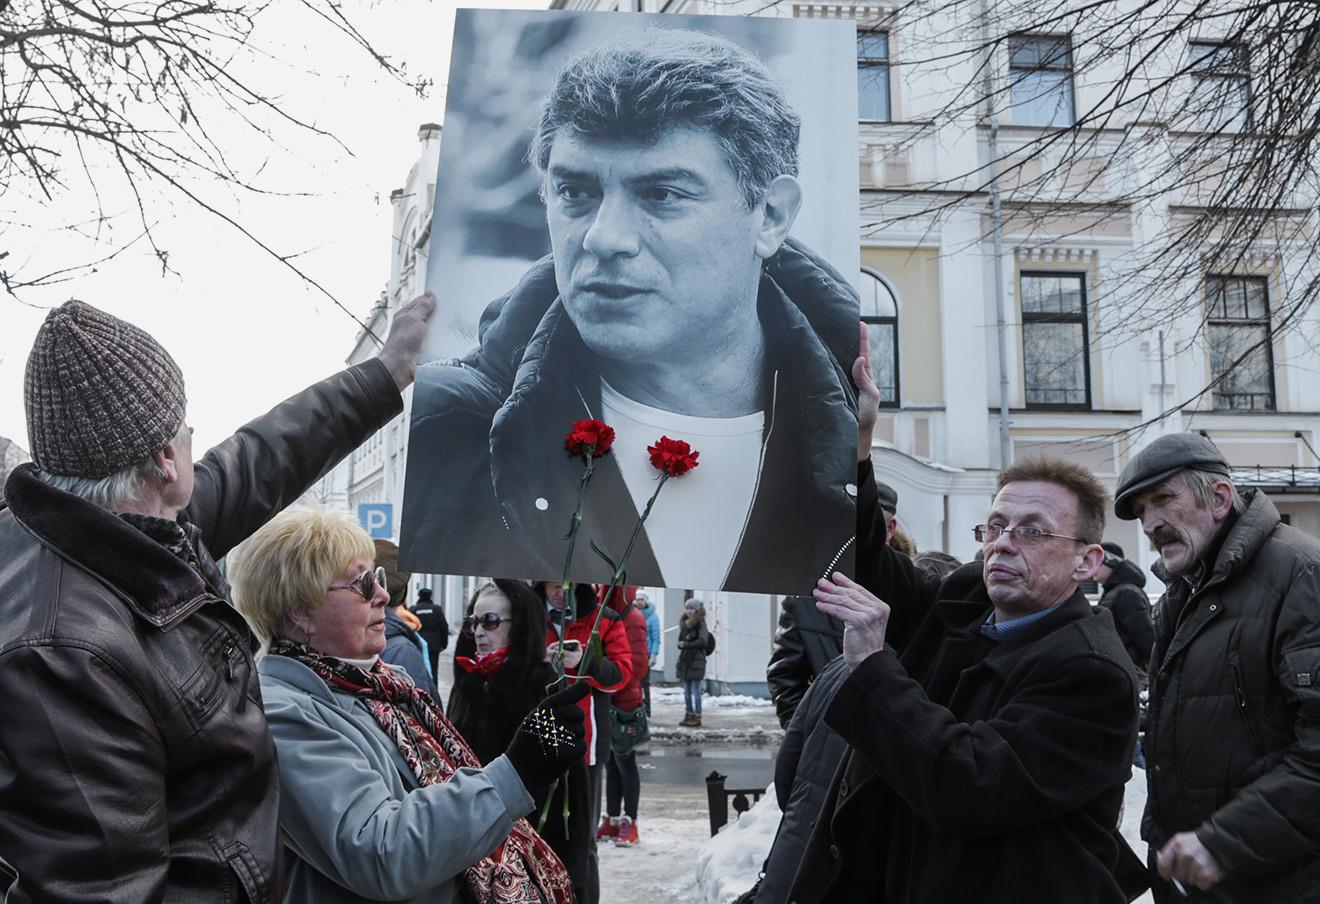 Марш памяти политика Бориса Немцова в Ярославле. Фото: Сергей Метелица / ТАСС